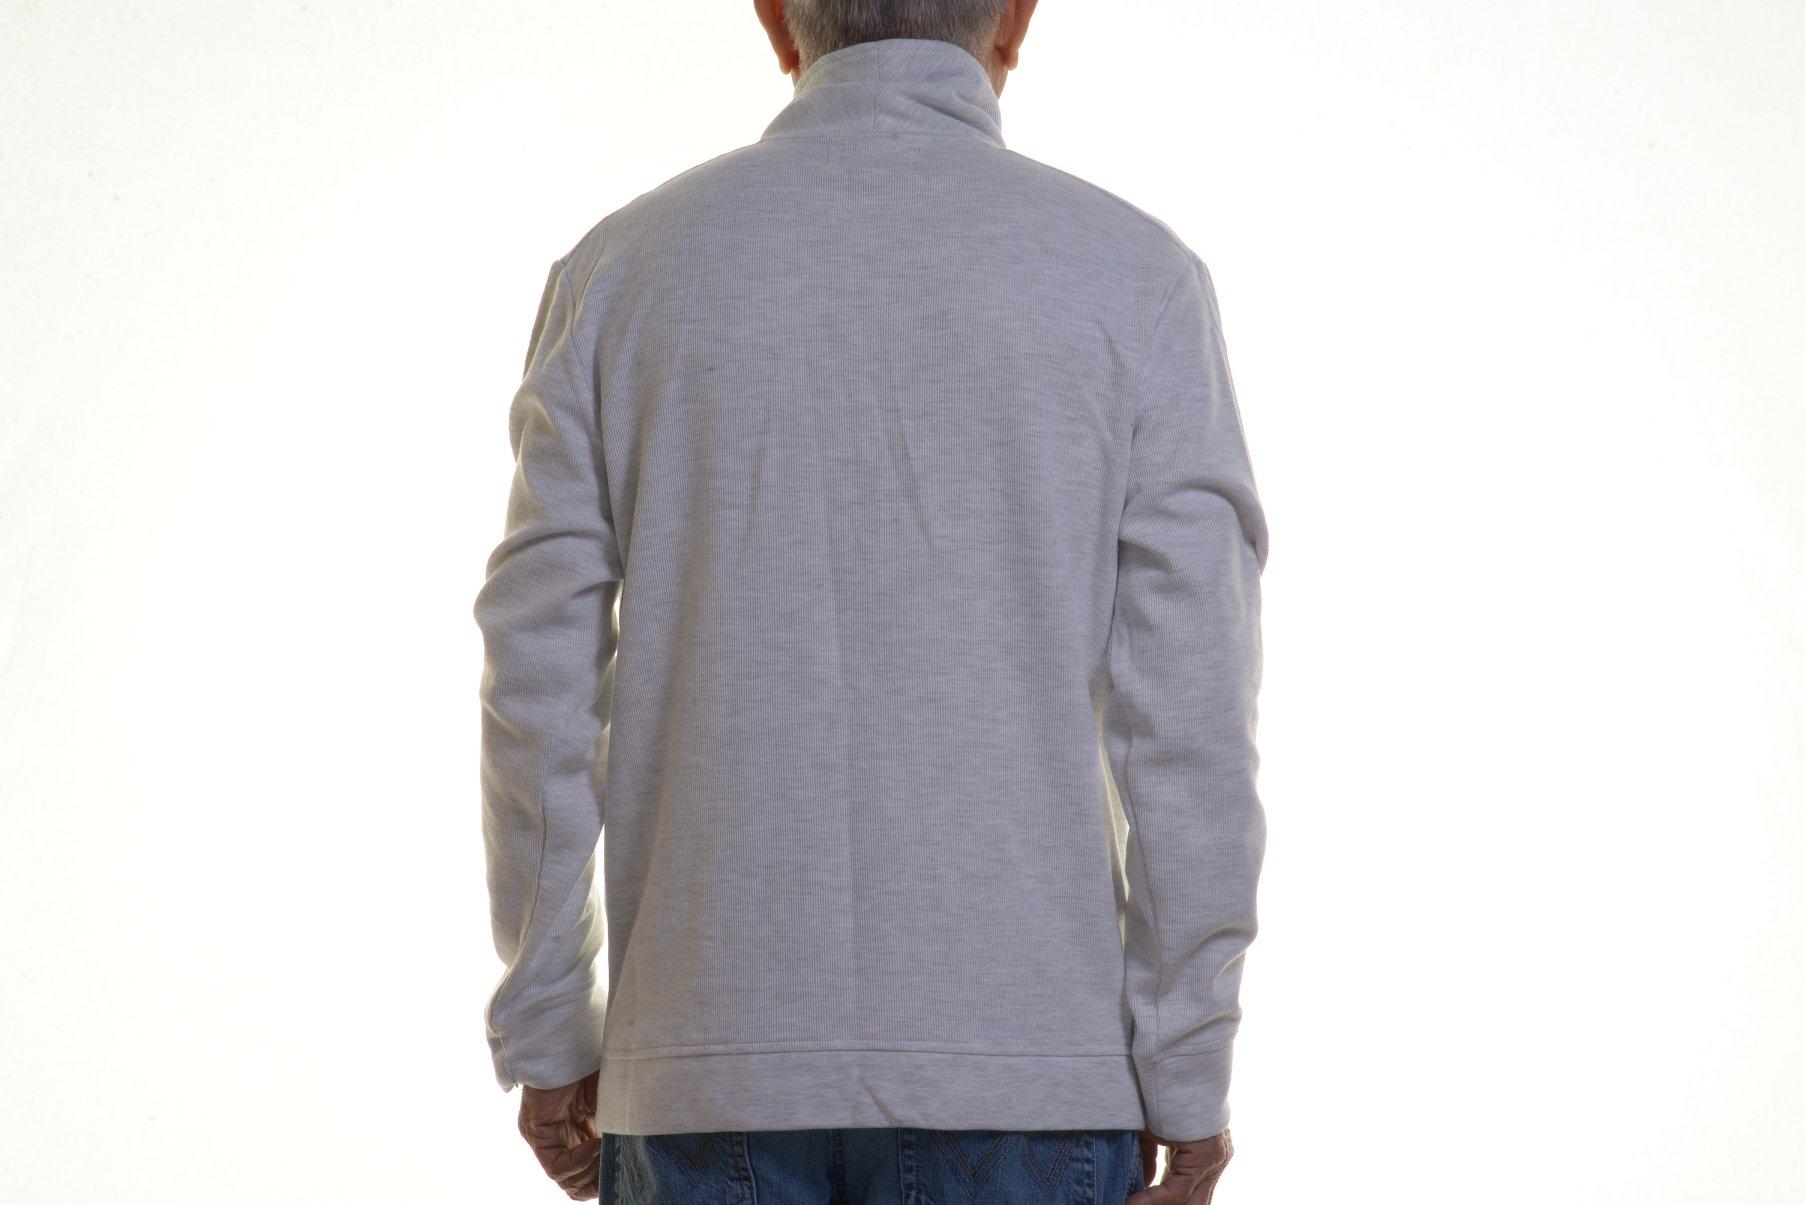 INC International Concepts Jordan Shawl Collar Jacket Cloud Grey Heather Size L